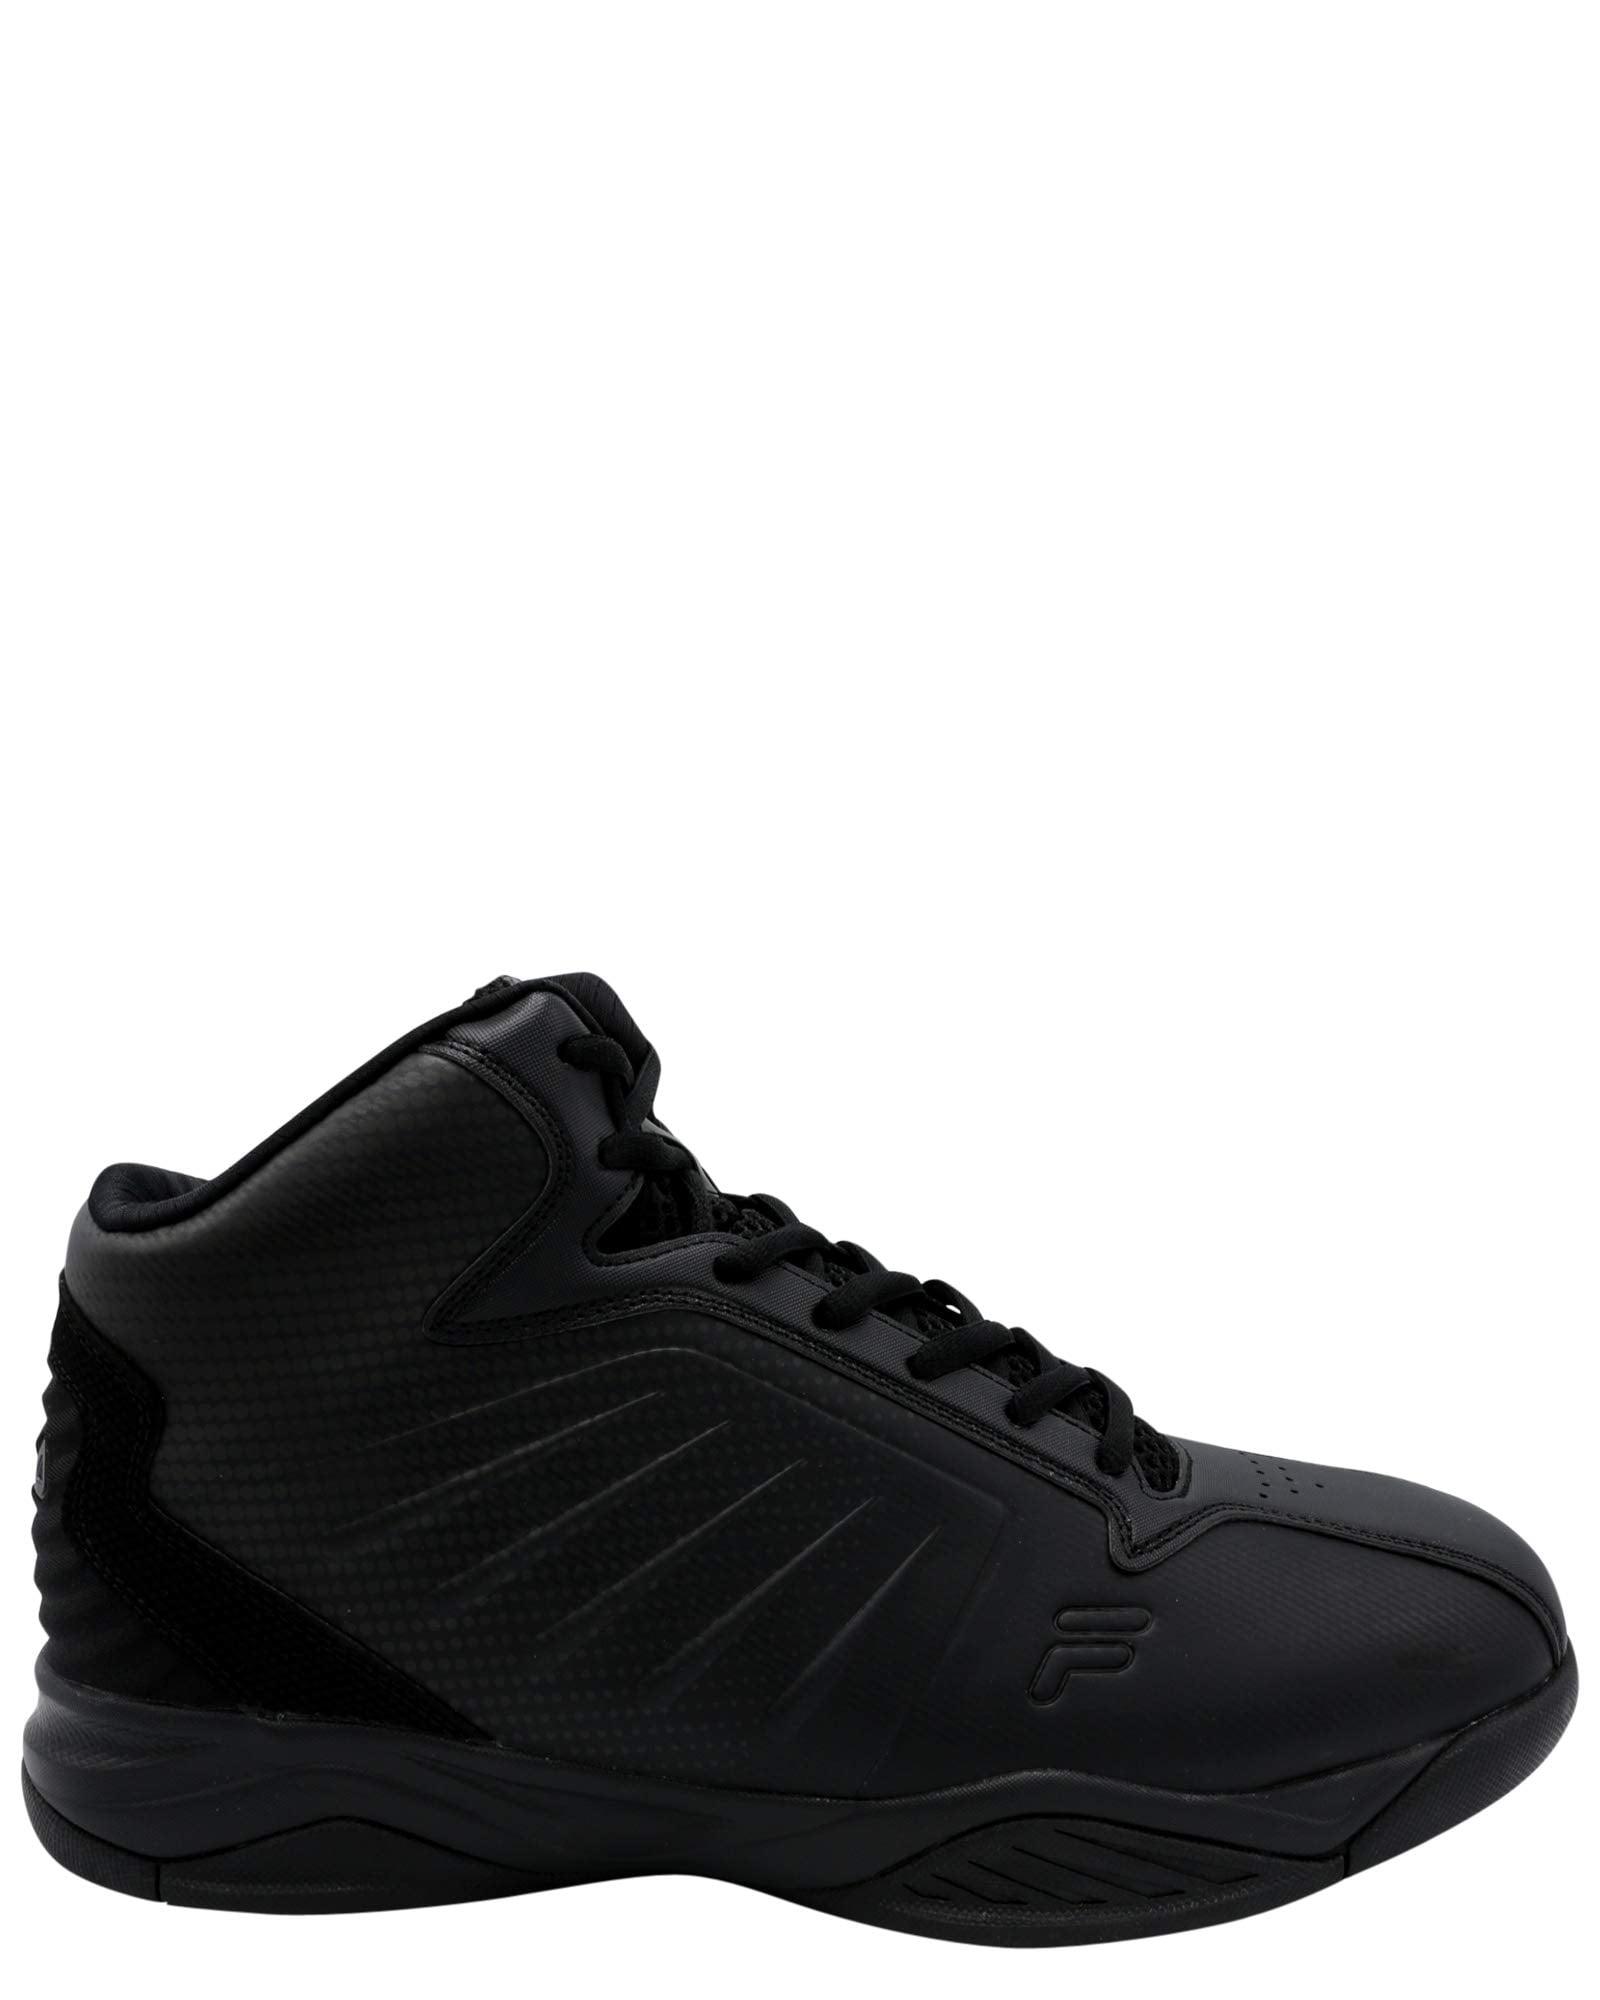 Fila Fila 1BM00190 001: Men's Entrapment 6 BlackBlack Sneakers (13 D(M) US Men)